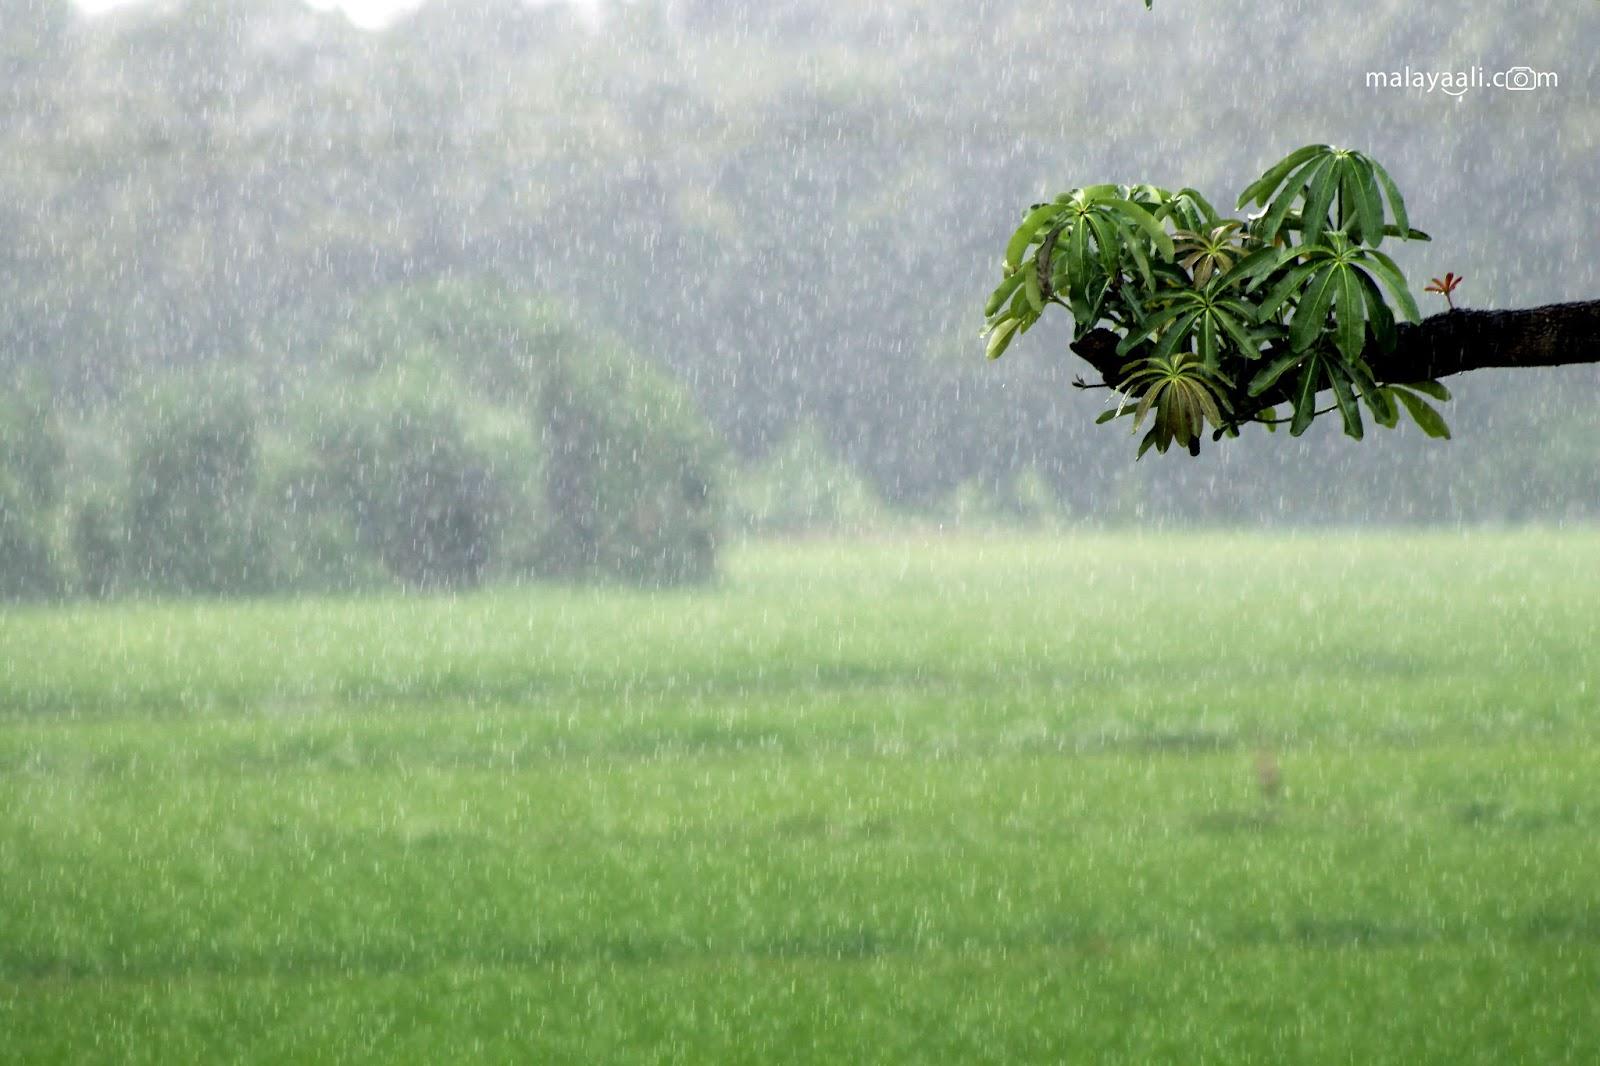 Malayali, Peringode, Malayali Peringode, Rain, Mansoon, Kerala, Sukrutham, മഴ, മലയാളി, പെരിങ്ങോട്, മലയാളി പെരിങ്ങോട്, തുലാവർഷം